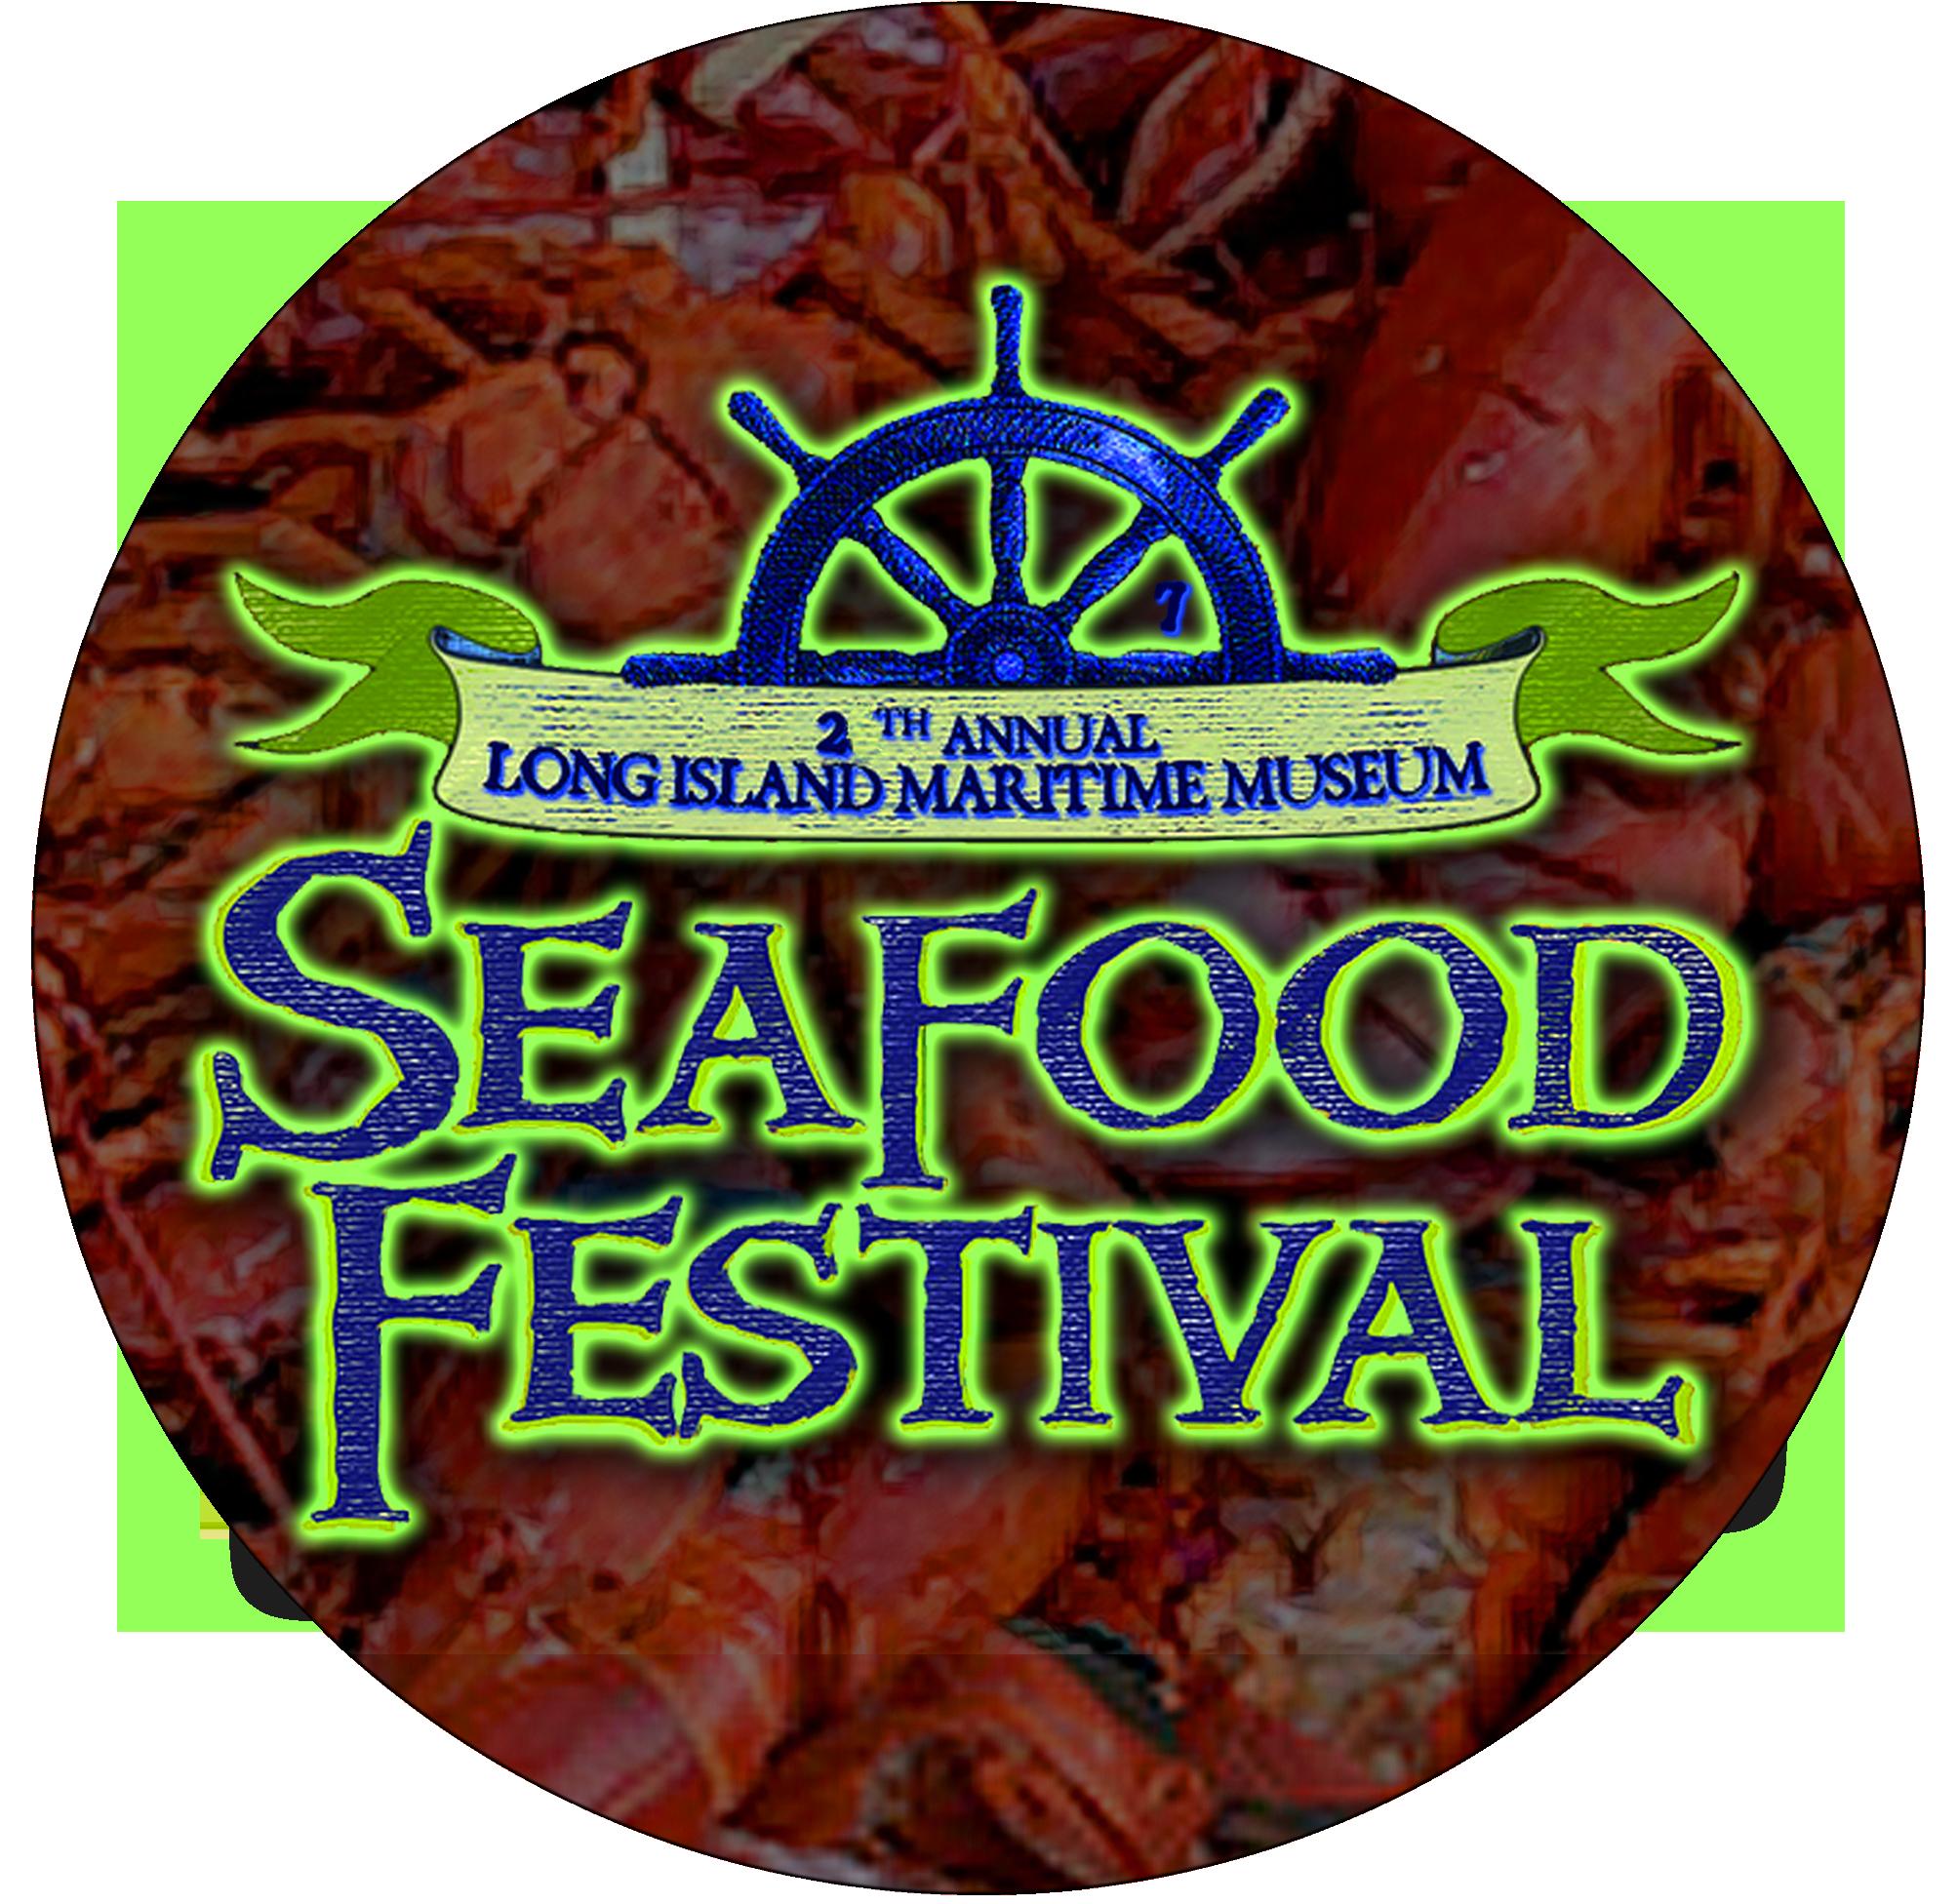 Long Island Seafood Festival